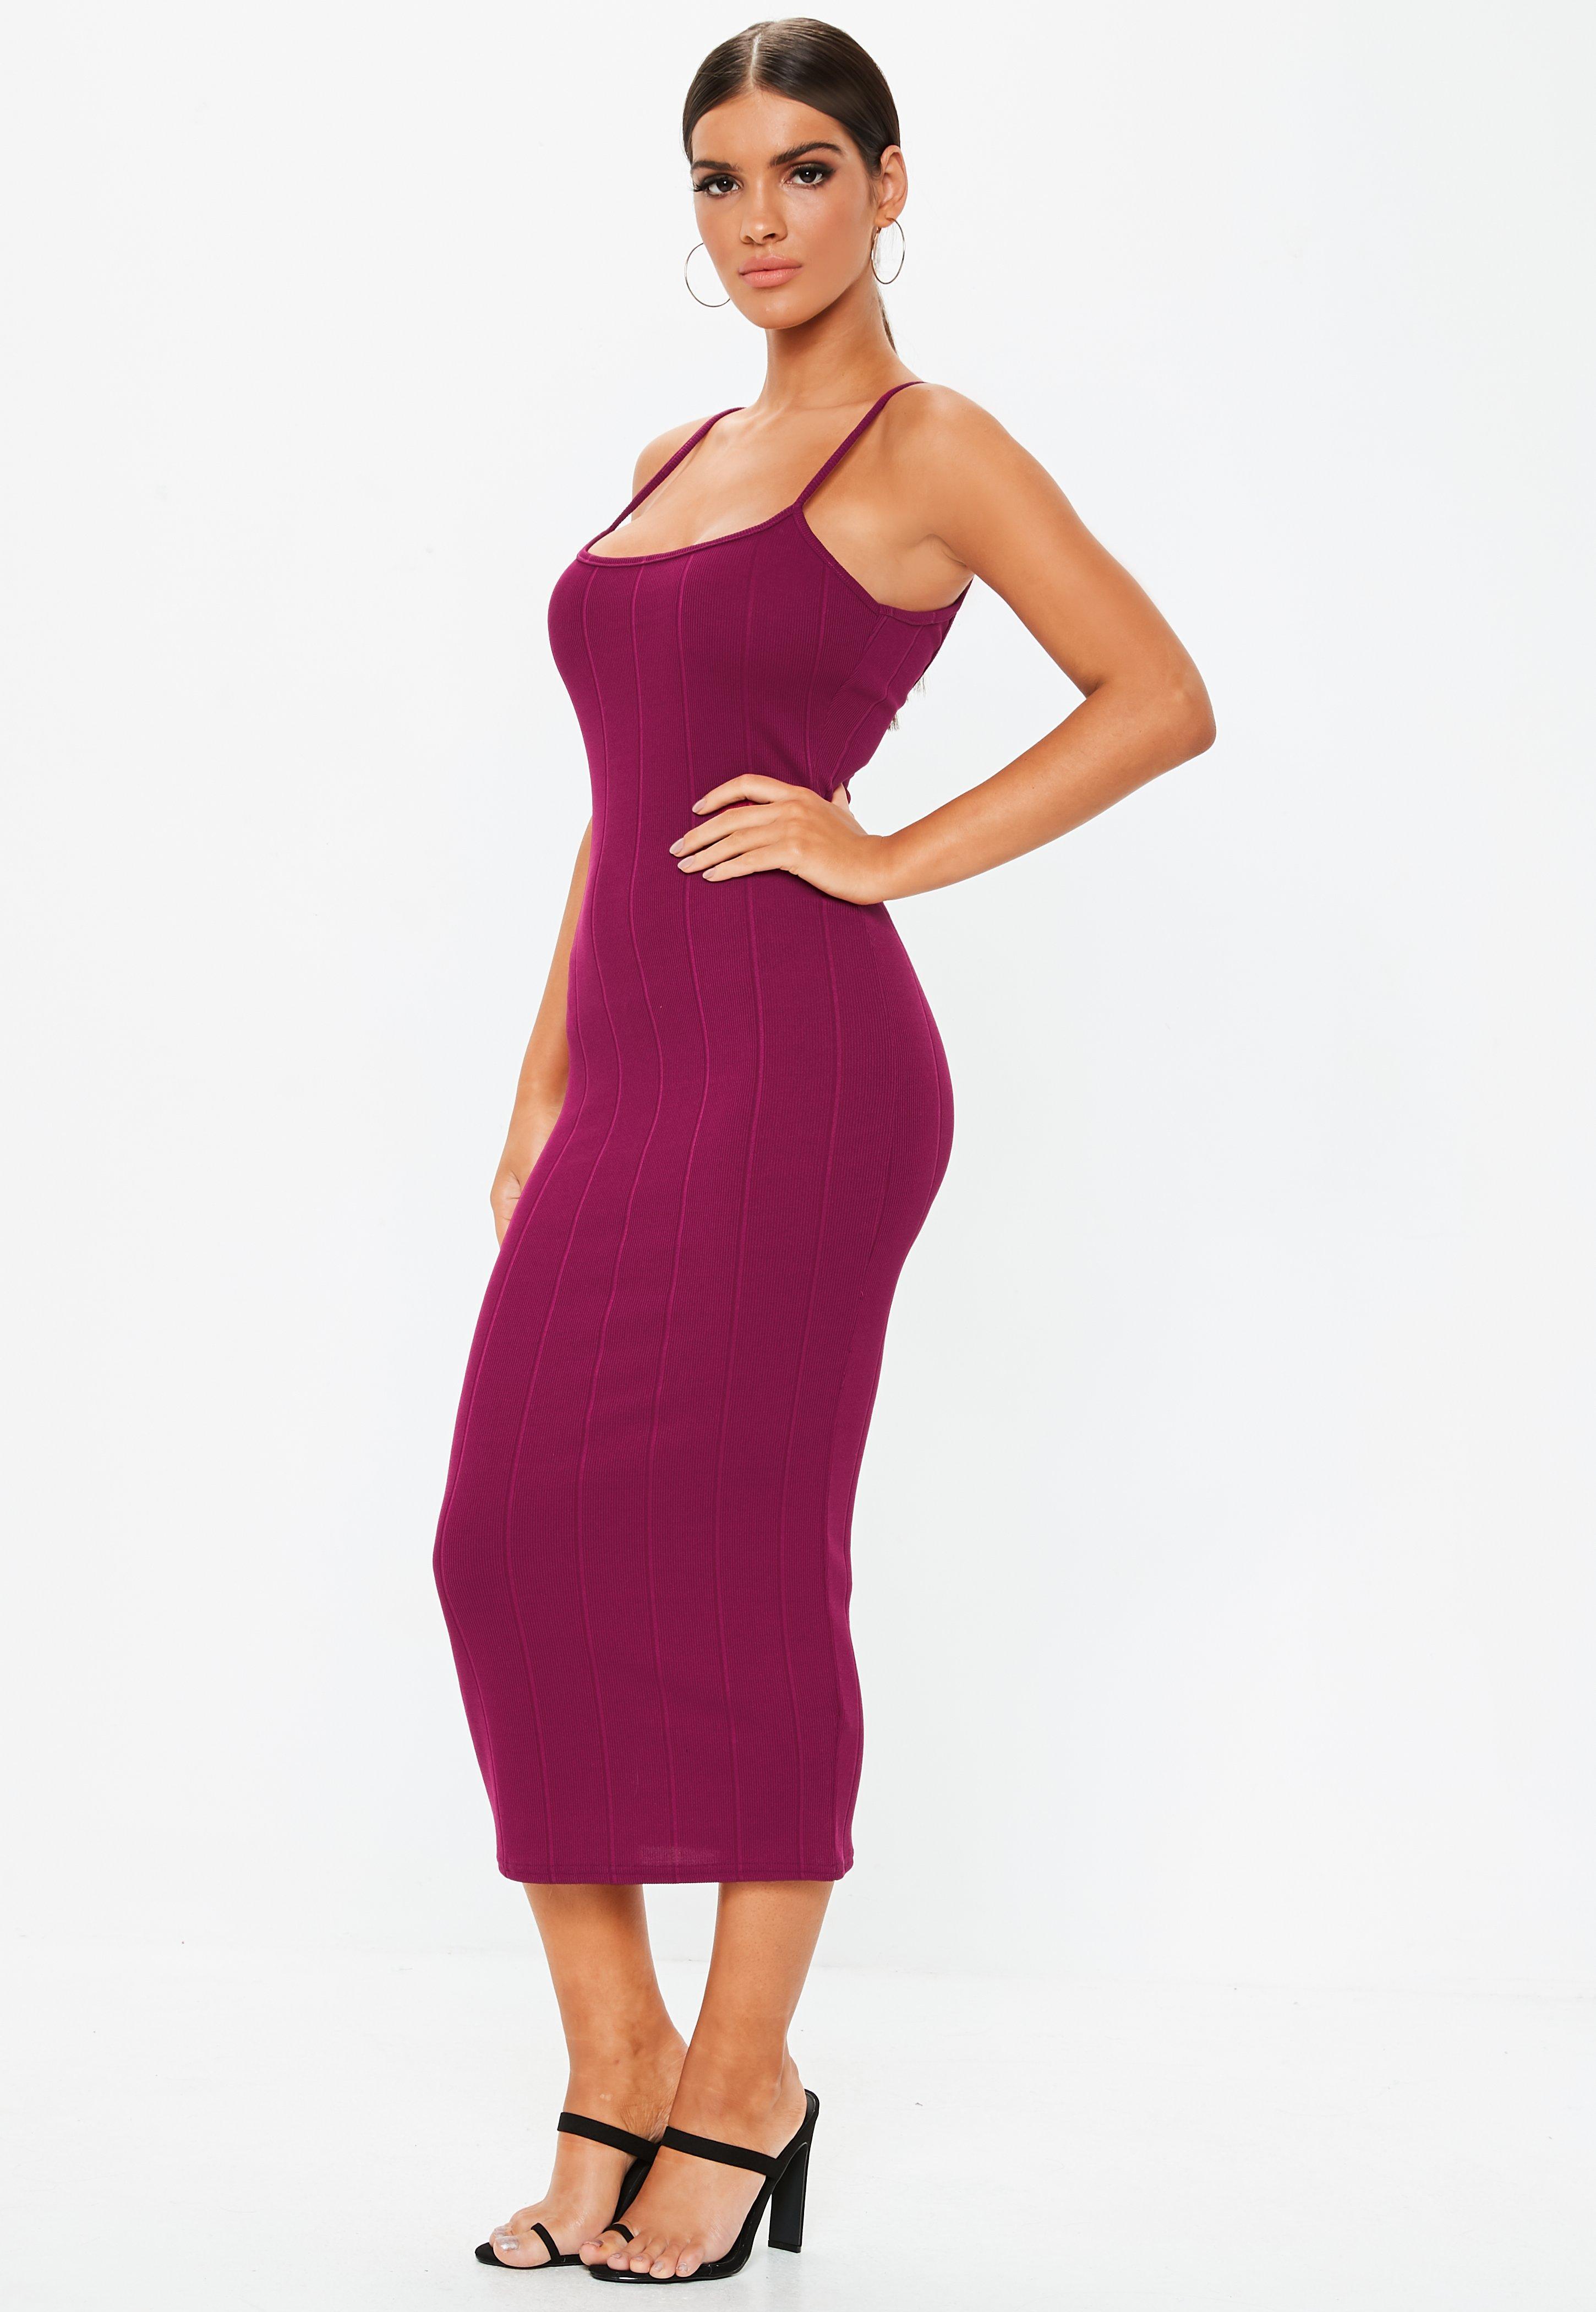 6a2077c338c4e2 Missguided - Purple Scoop Neck Strappy Bandage Midi Dress - Lyst. View  fullscreen